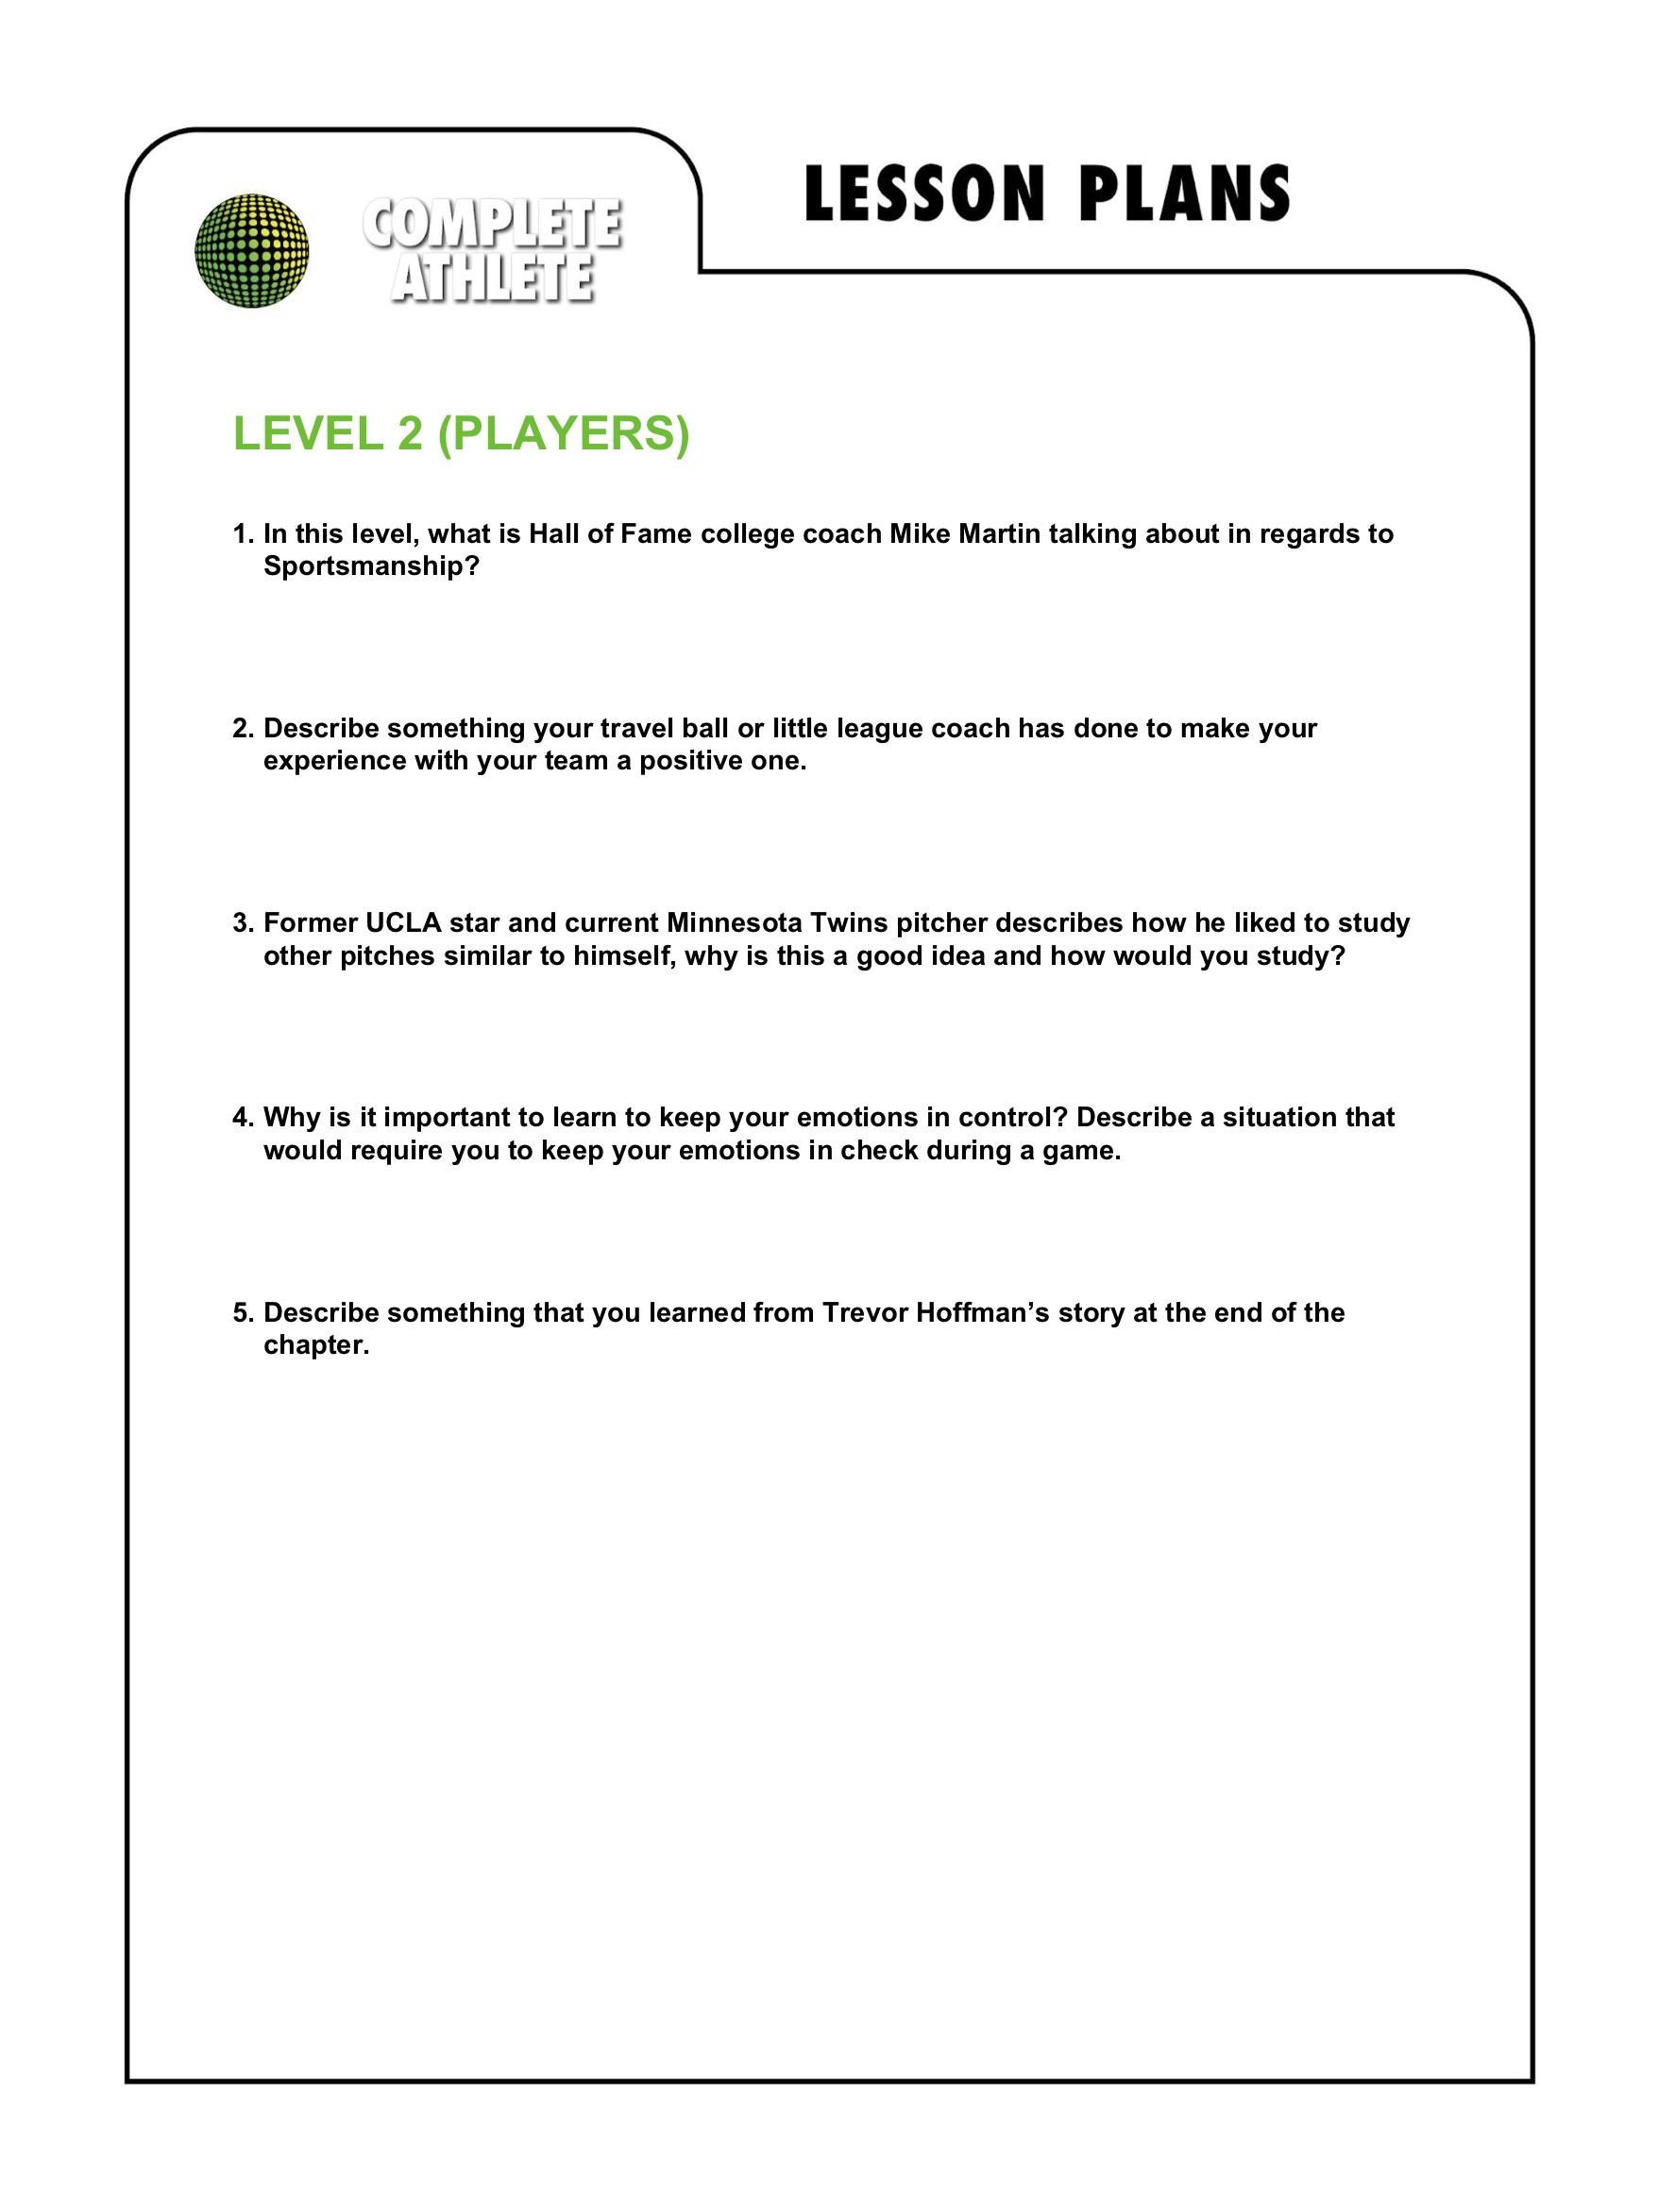 Lesson Plan Level 2.jpg